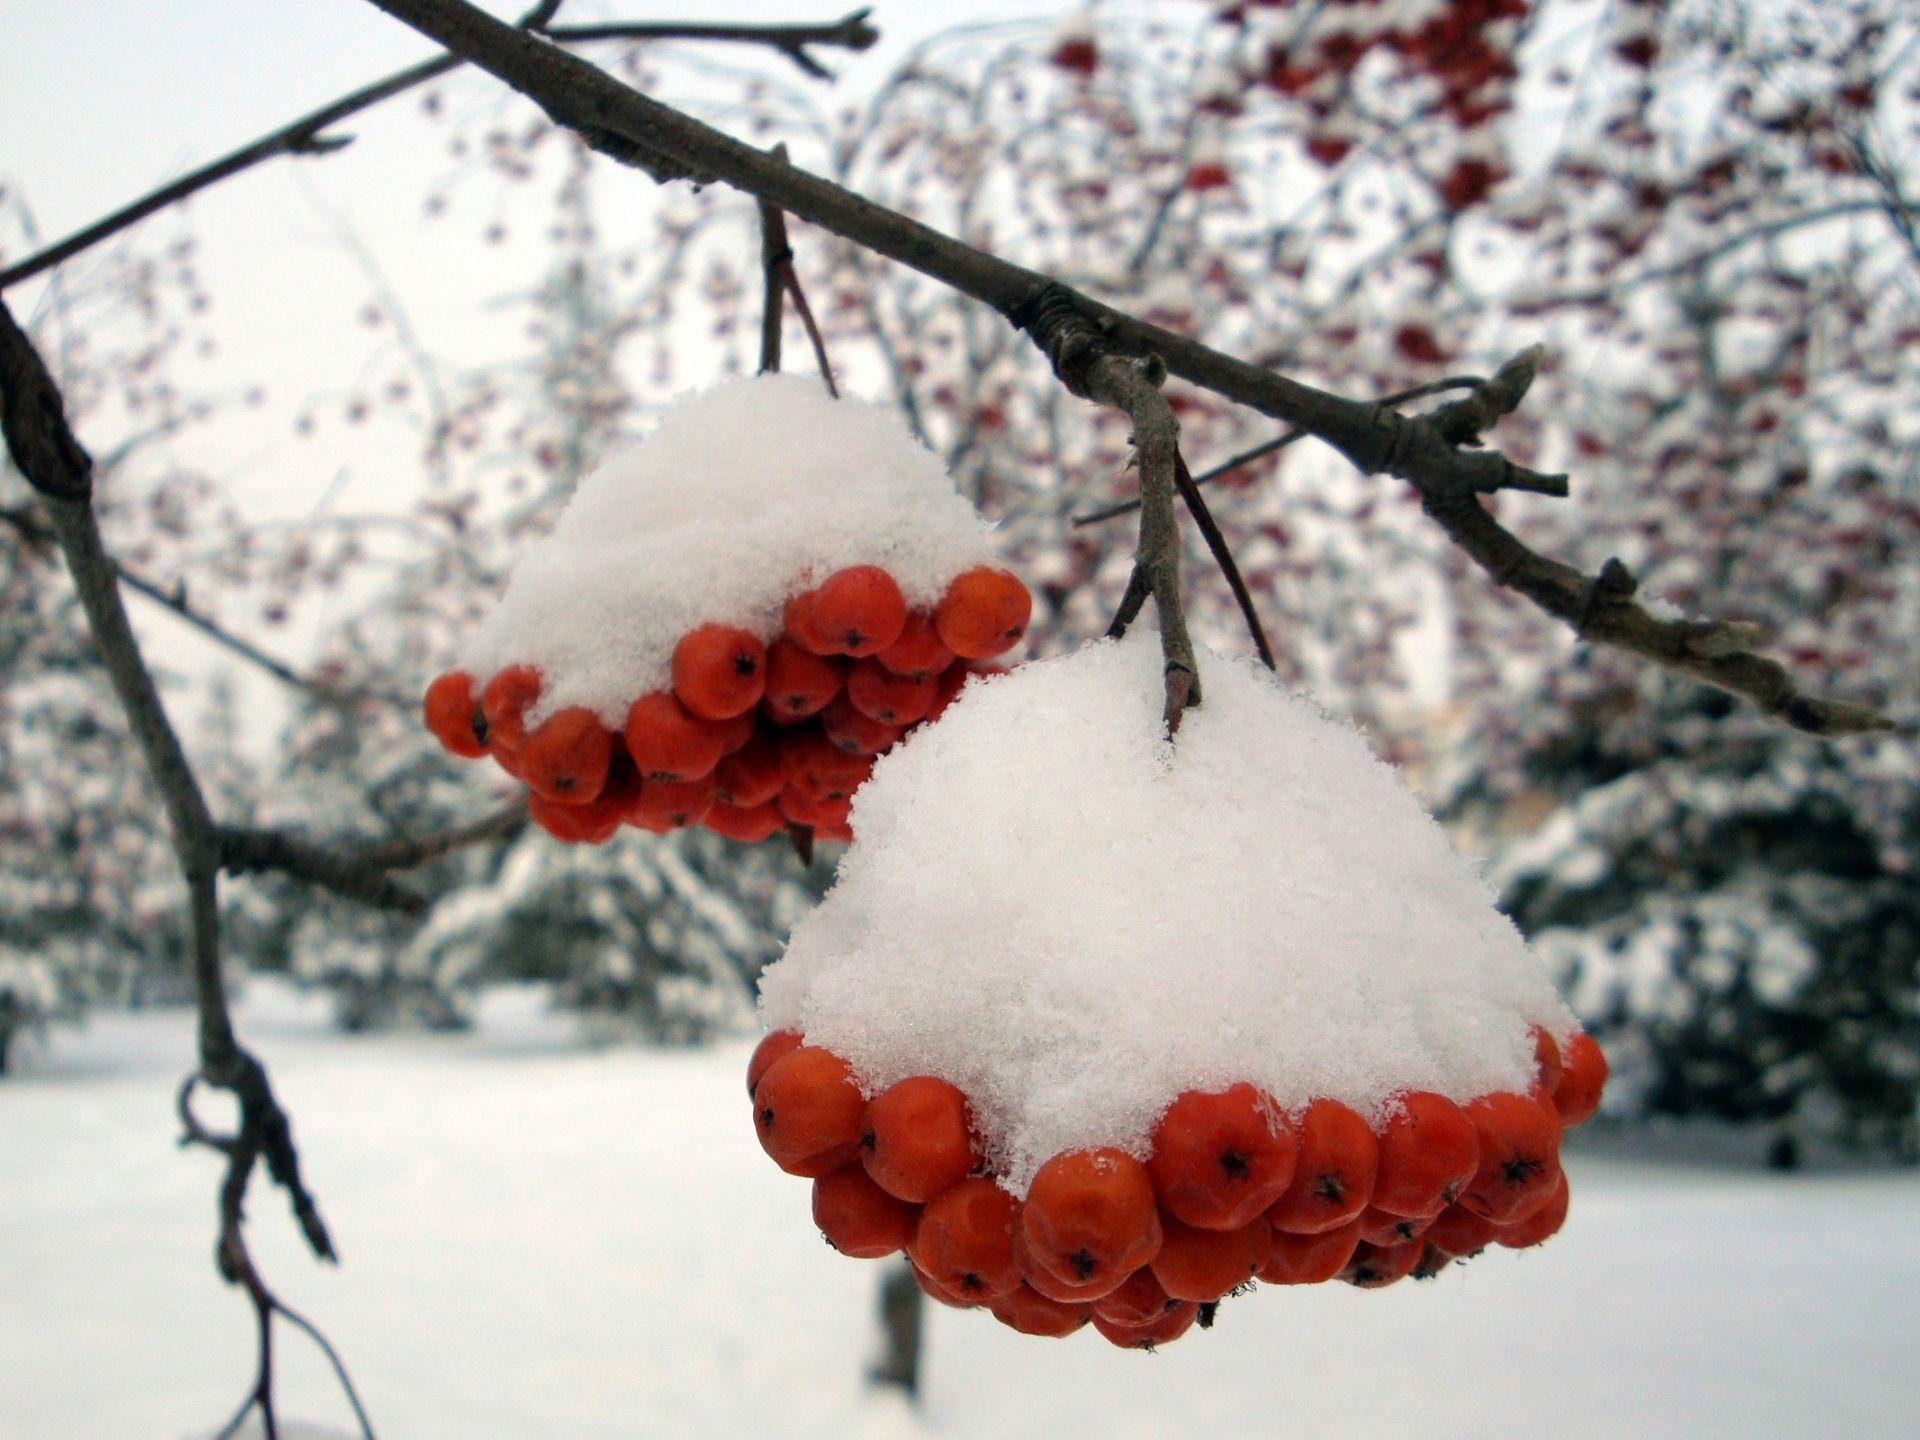 ilona wallpapers beautiful snowy - photo #37